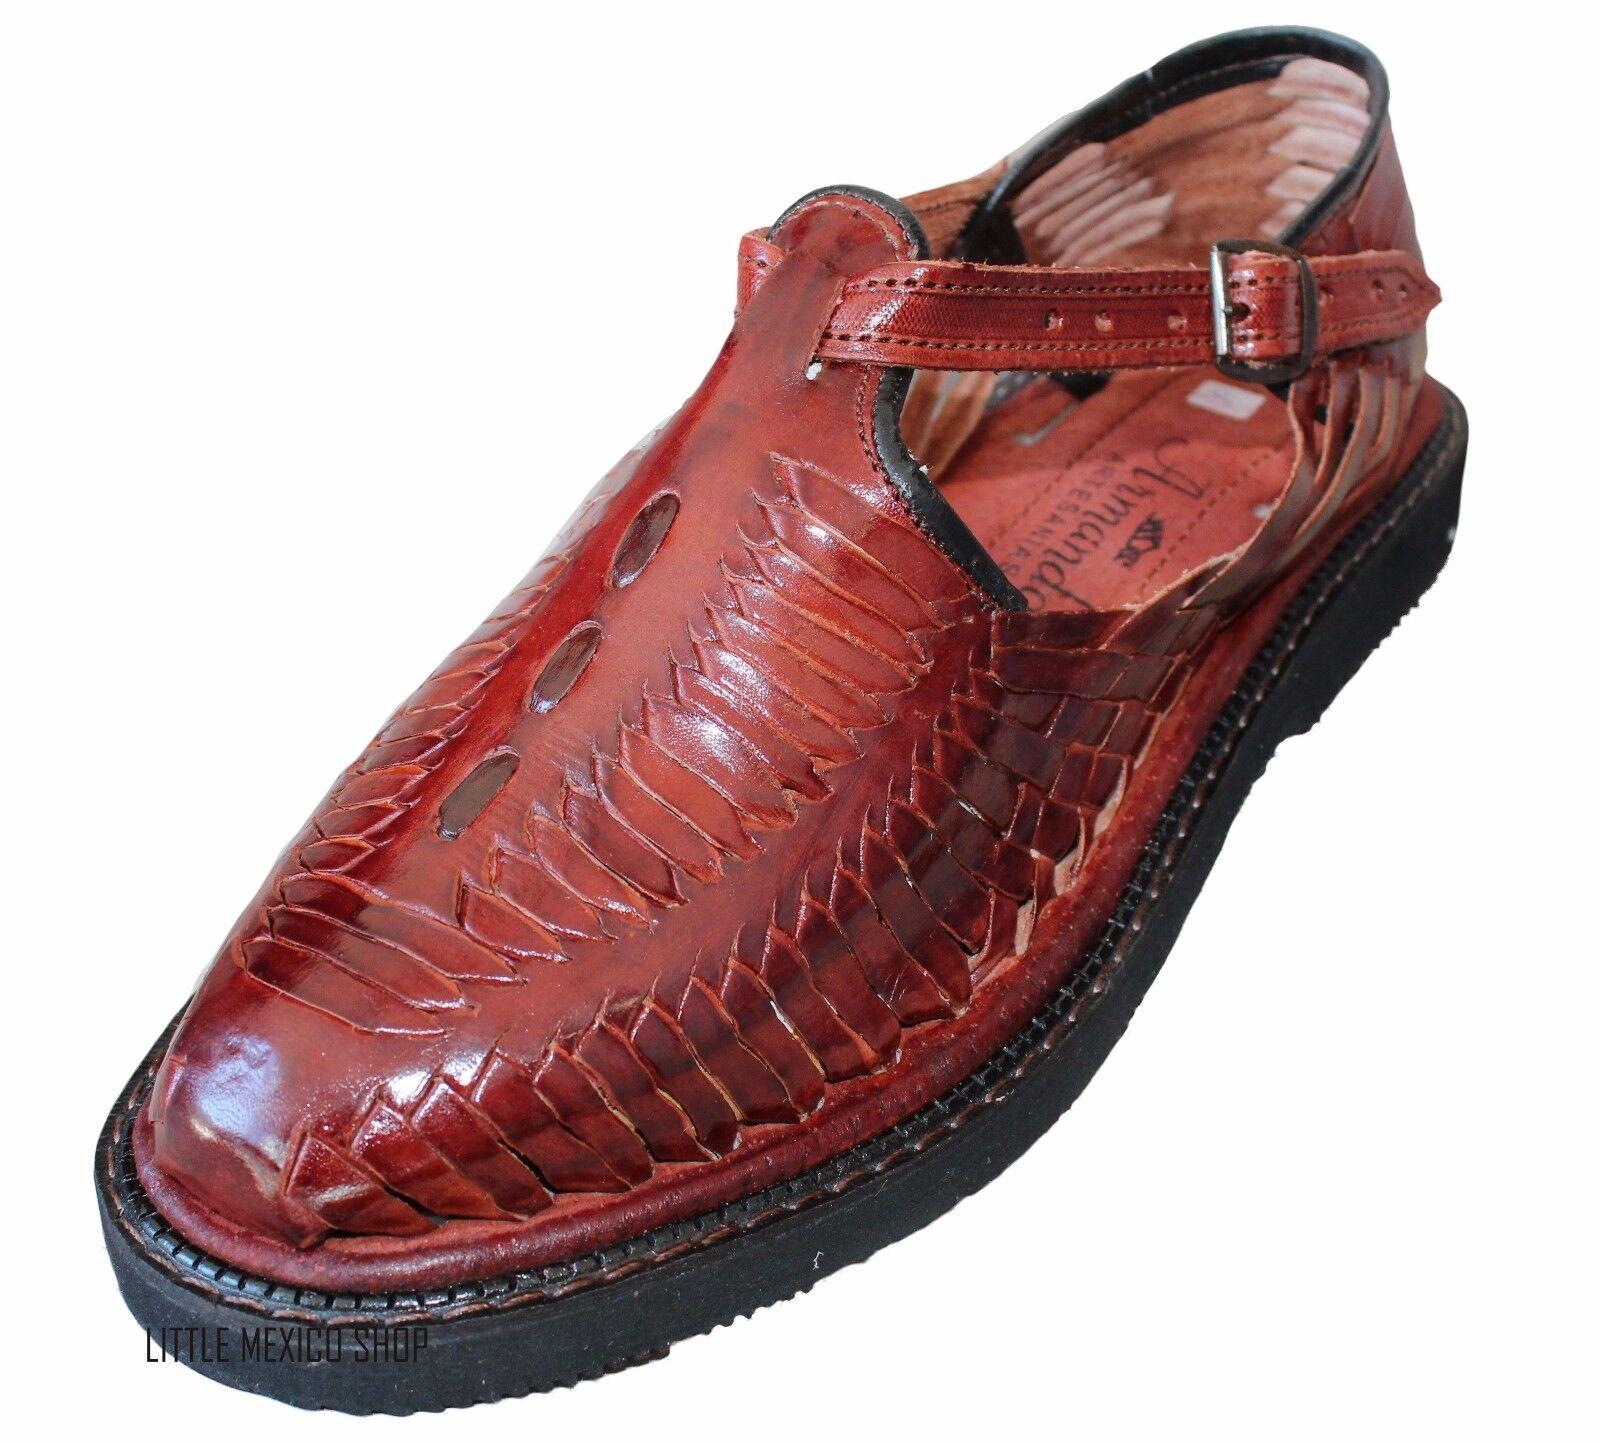 Men's Closed Toe Huarache Sandals WINE - MEXICAN HUARACHES Leather Mocassin